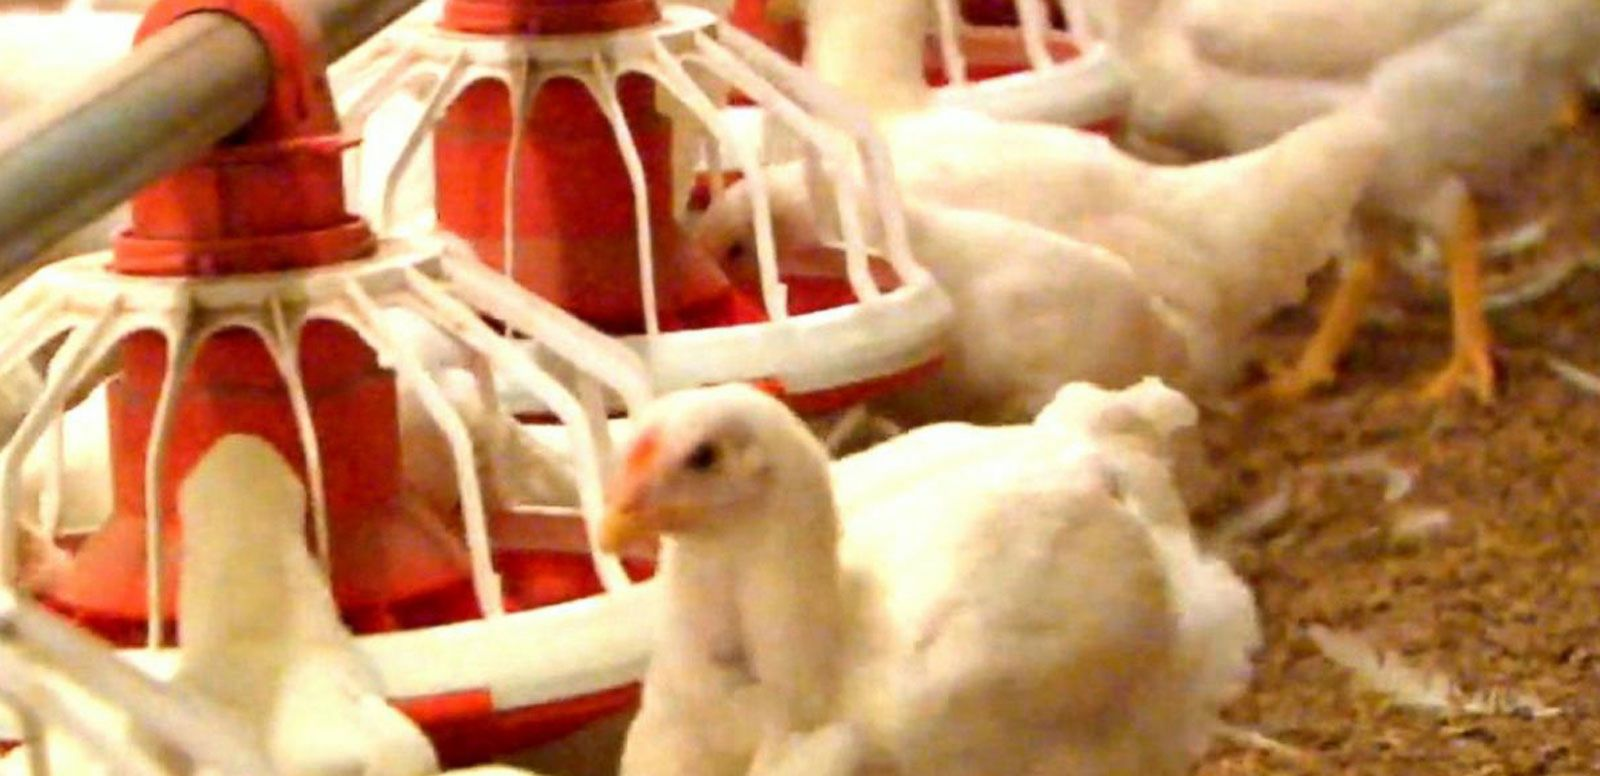 VIDEO: McDonald's Says No to Chicken With Antibiotics